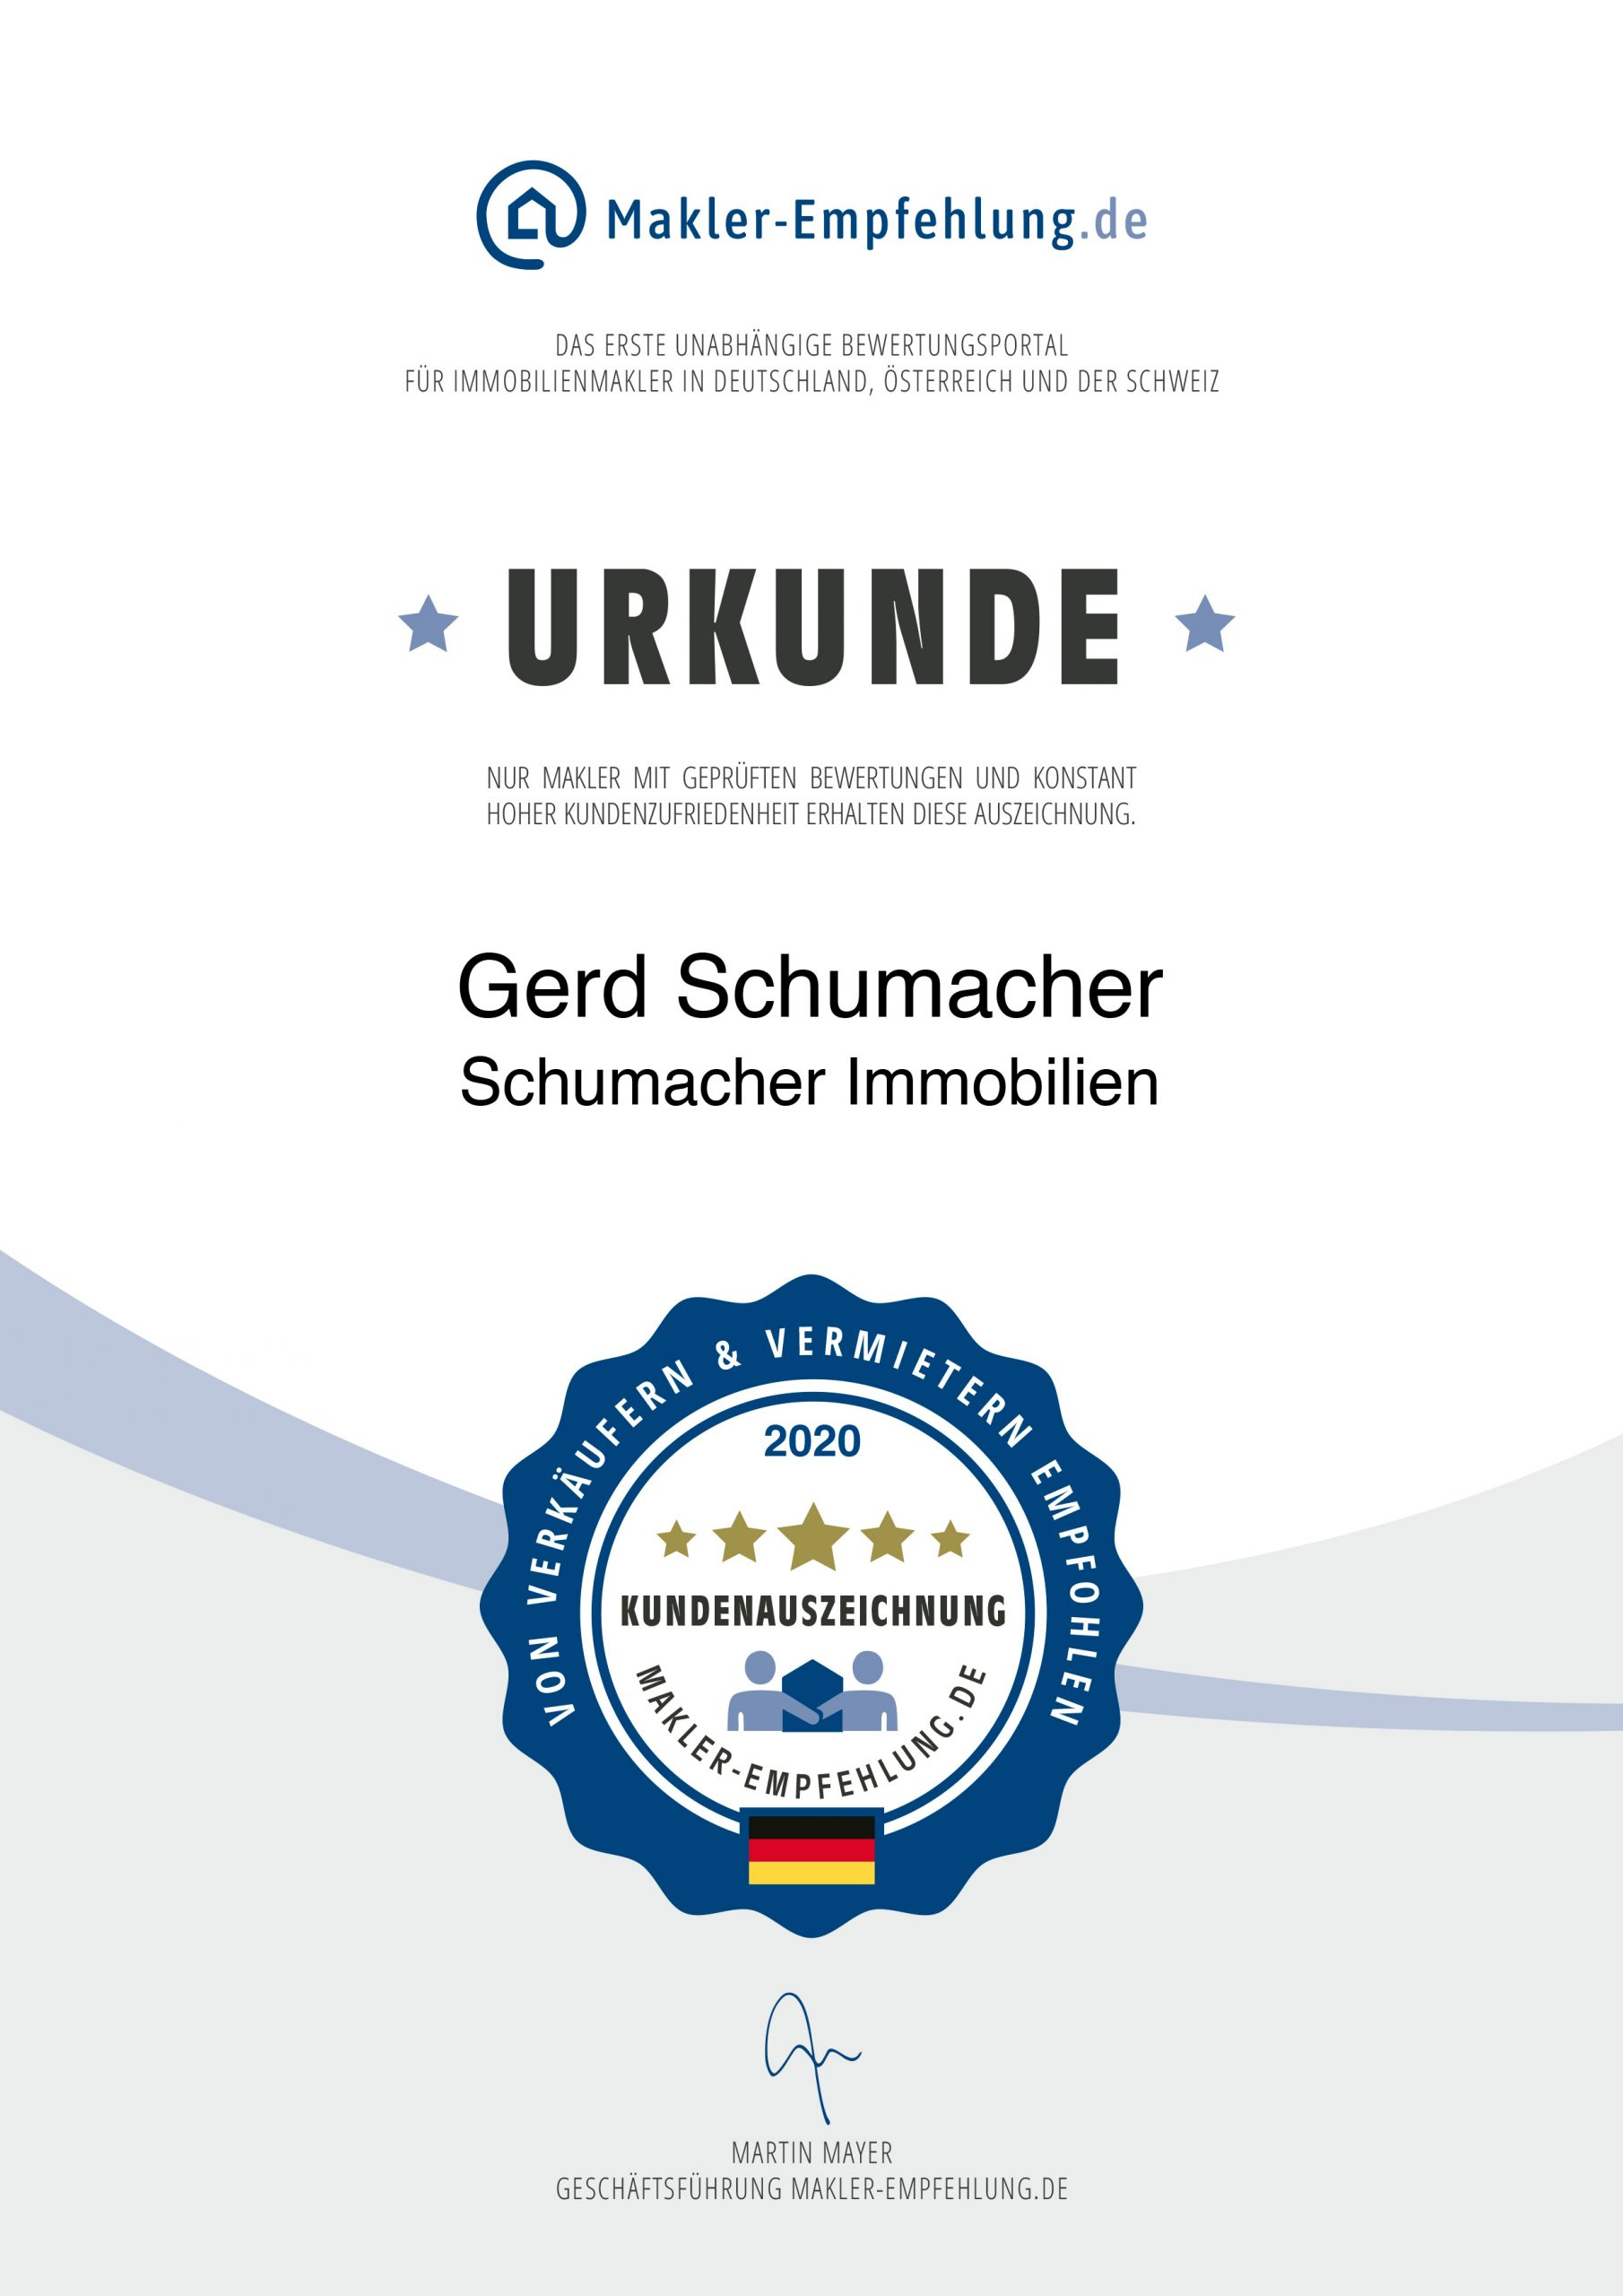 2020 Markler-Empfehlung.de